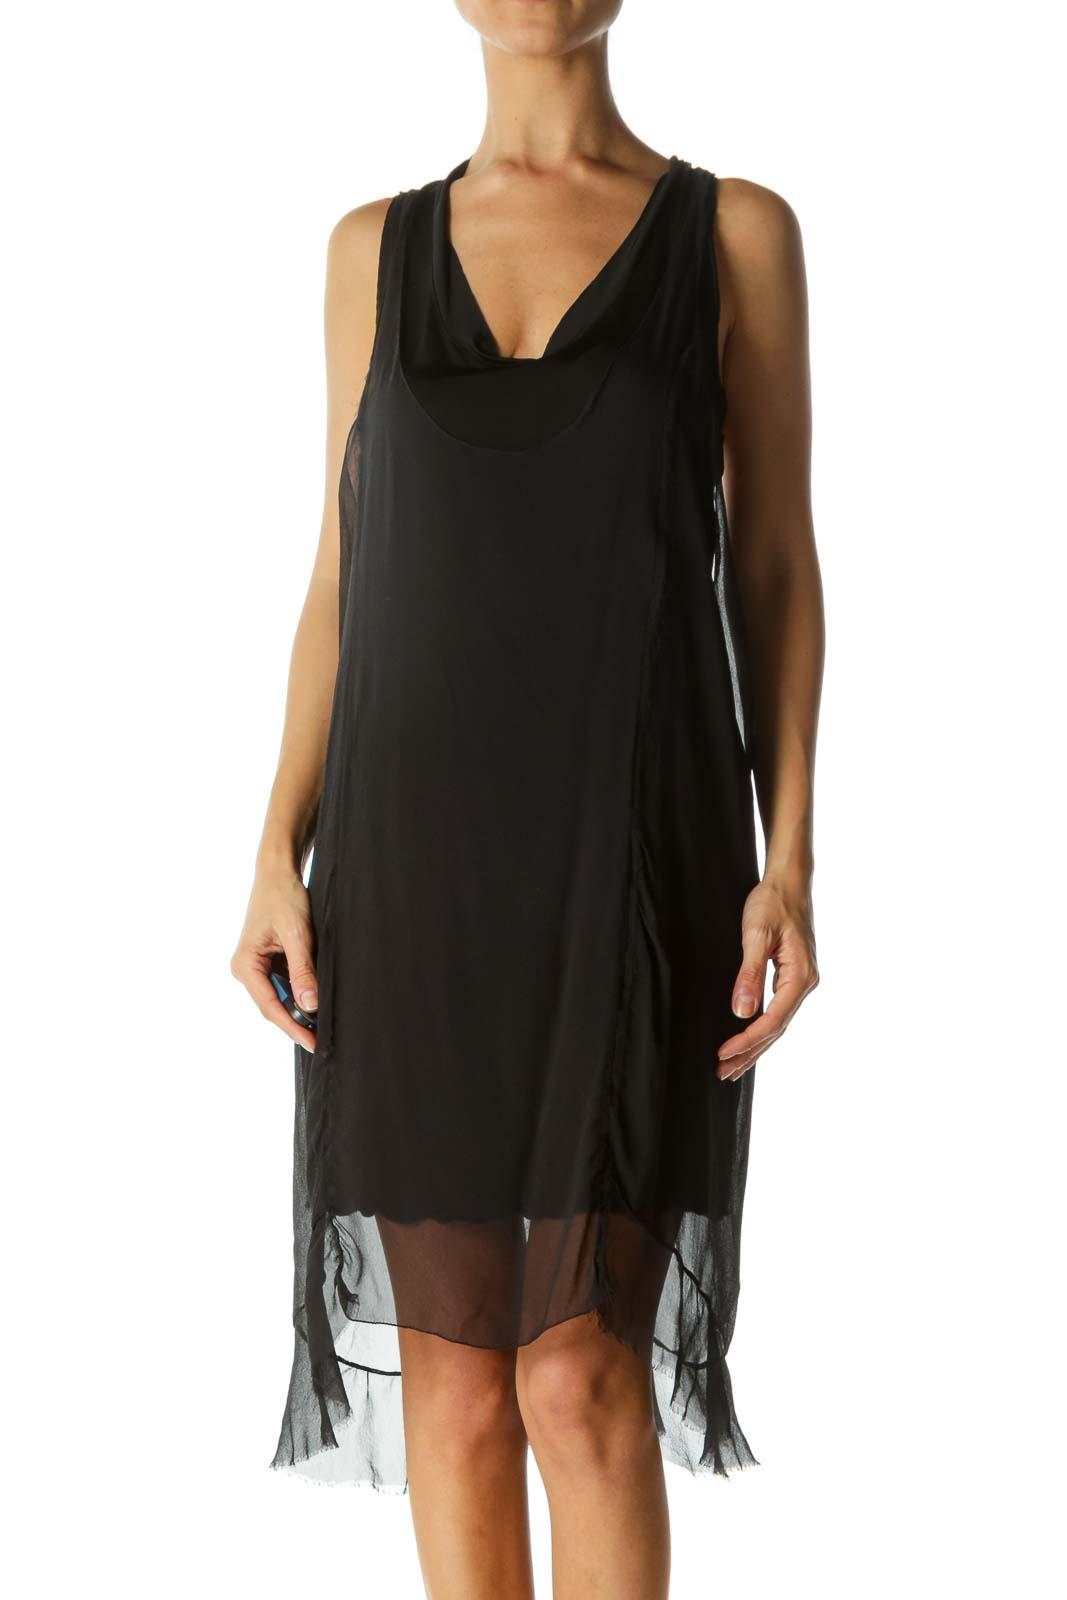 Black Silk Blend Round Neck Stretch Lining Dress Front